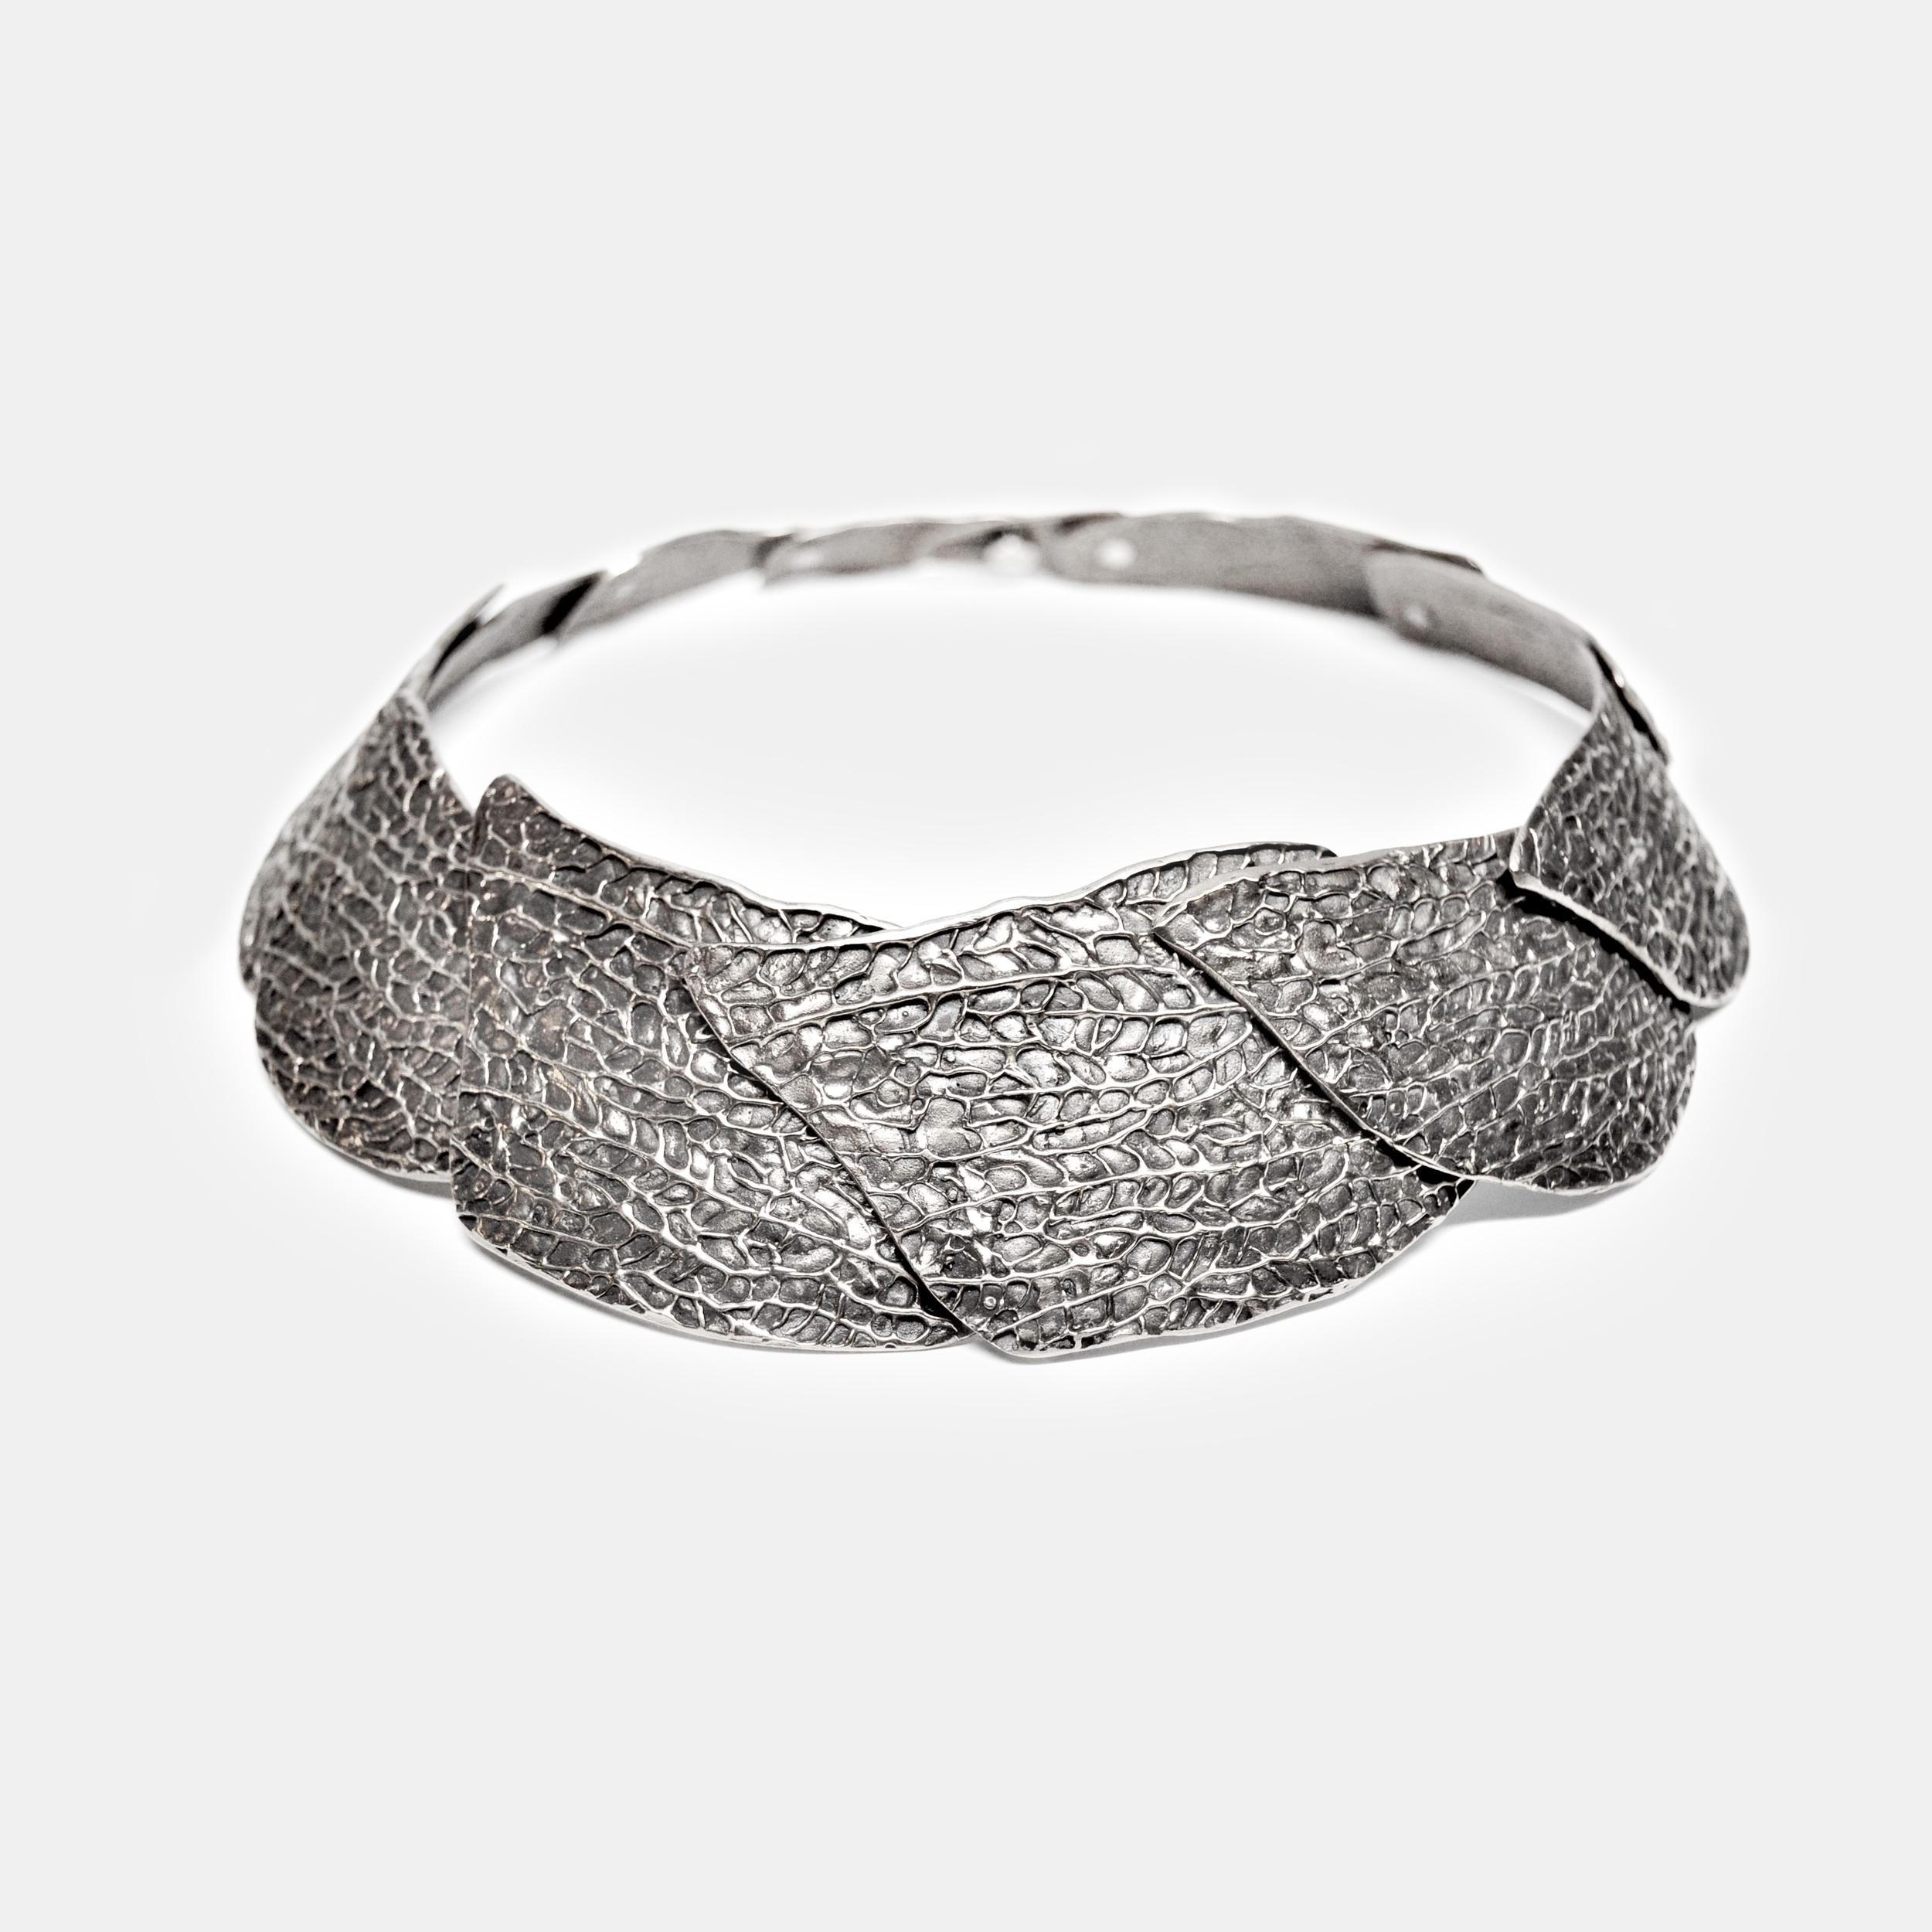 Marisa_Lomonaco_Hudson_Valley_custom_Jewelry_0002_Silver_Coral_Lace_Necklace.jpg